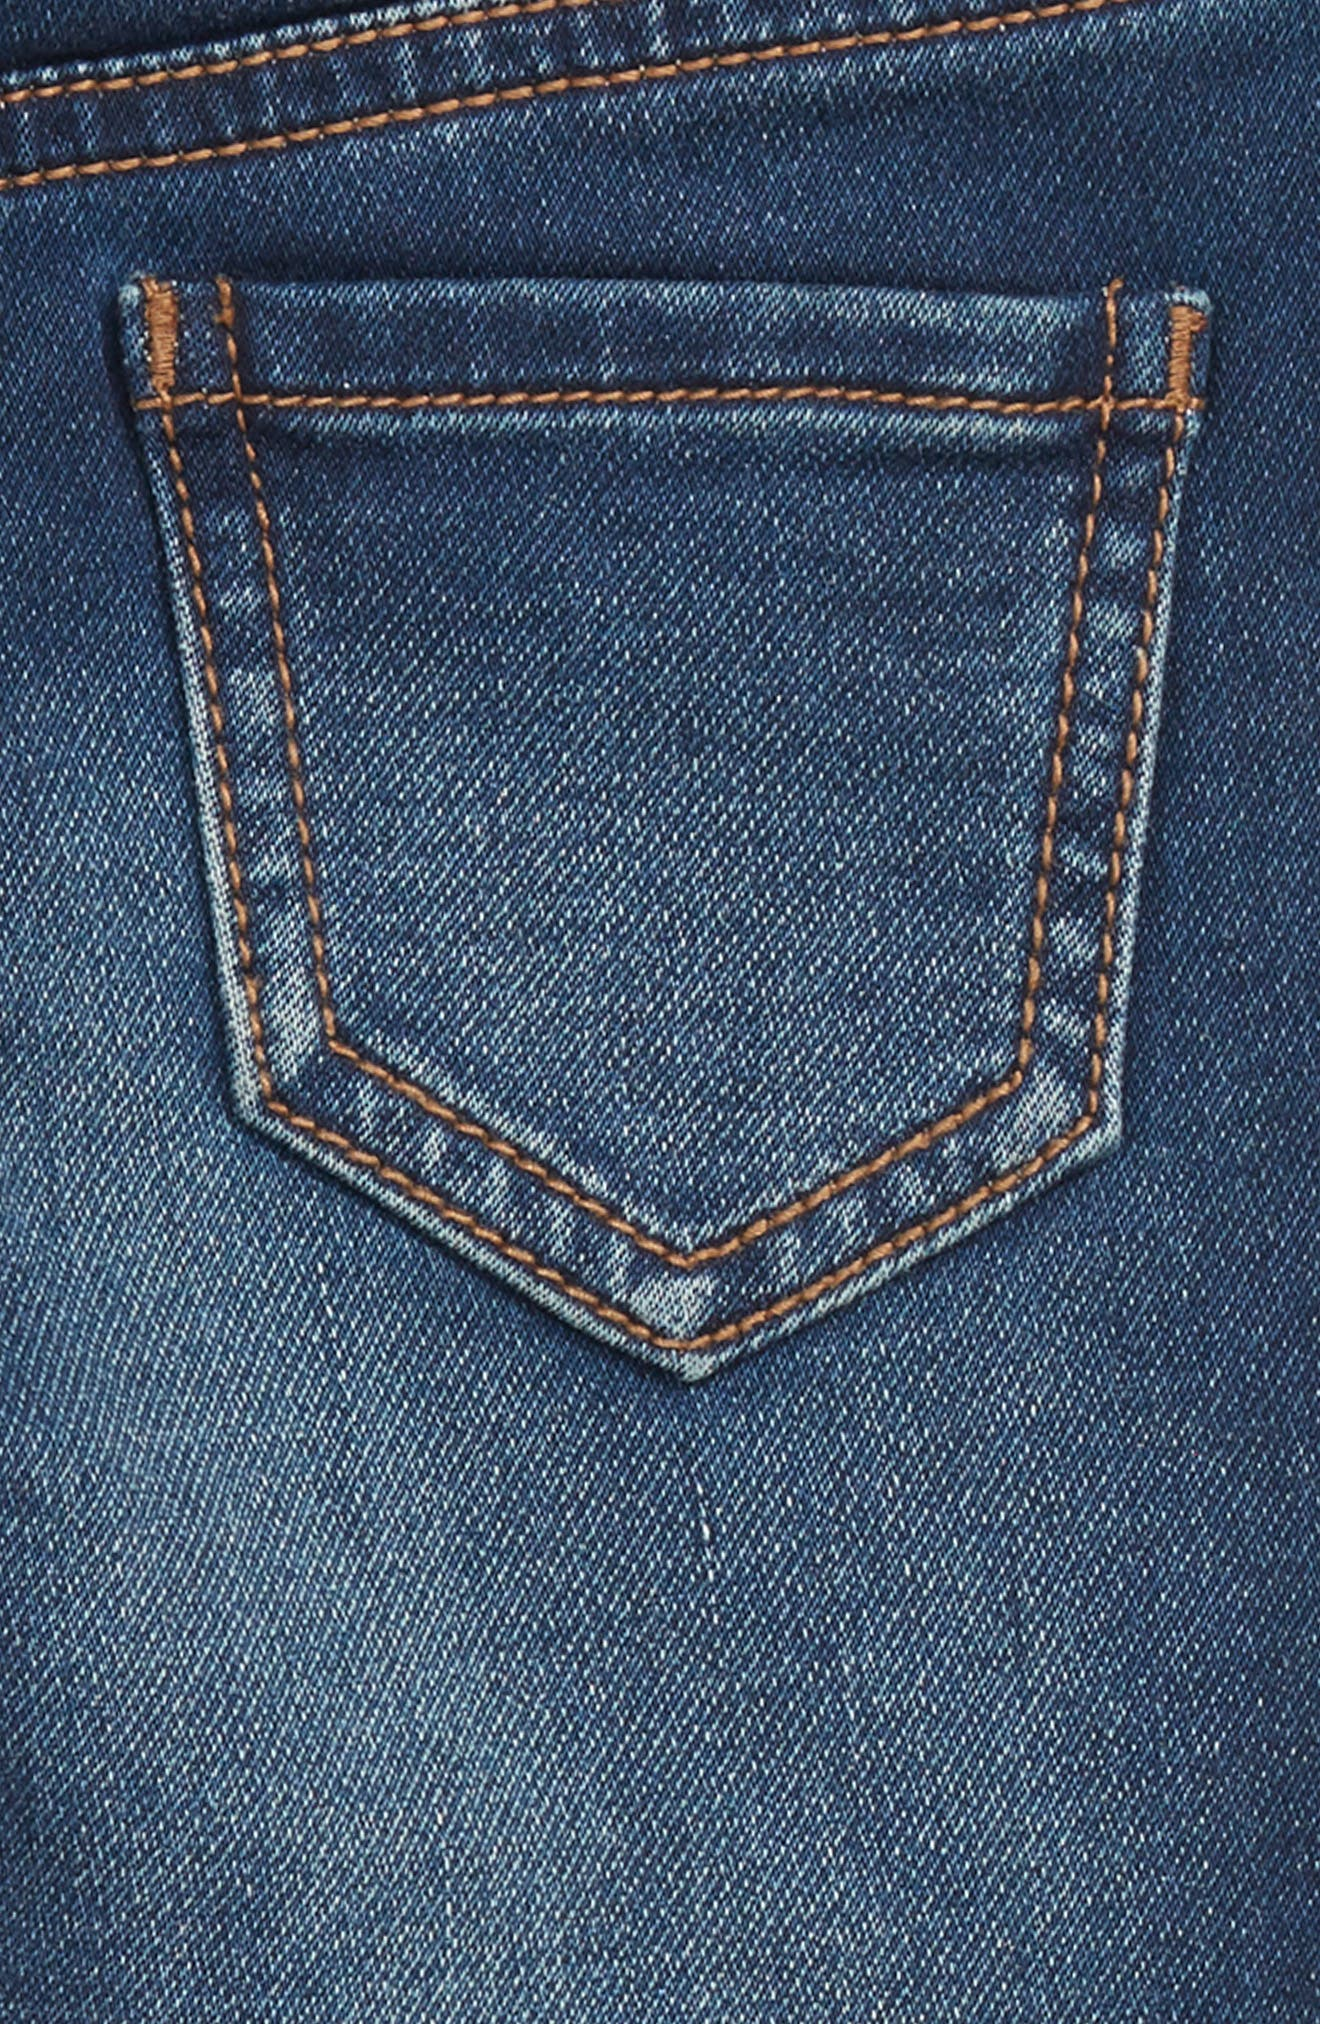 Taylor Jeans,                             Alternate thumbnail 3, color,                             RINSE